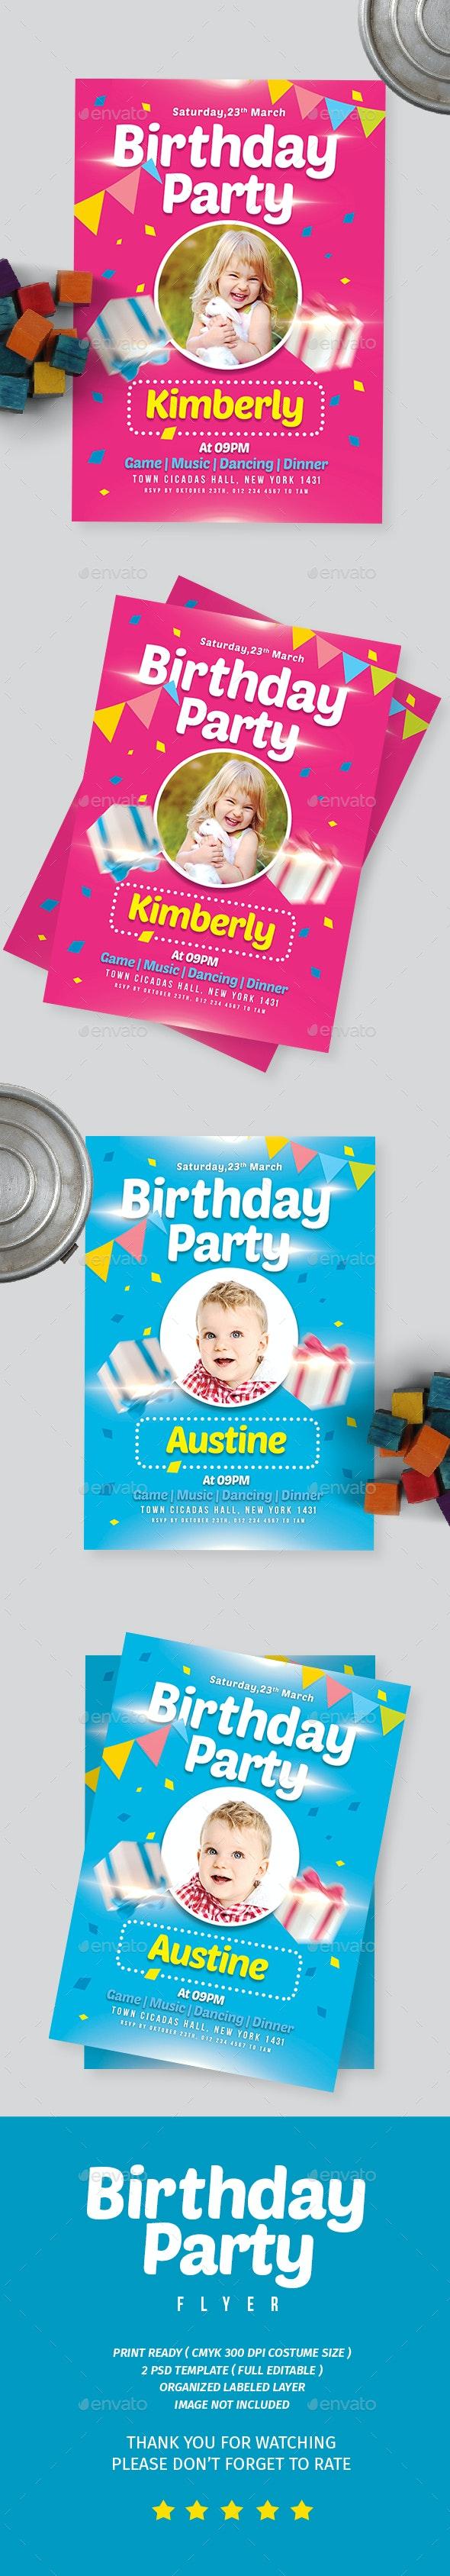 Kids Birthday Party Invitation - Flyers Print Templates